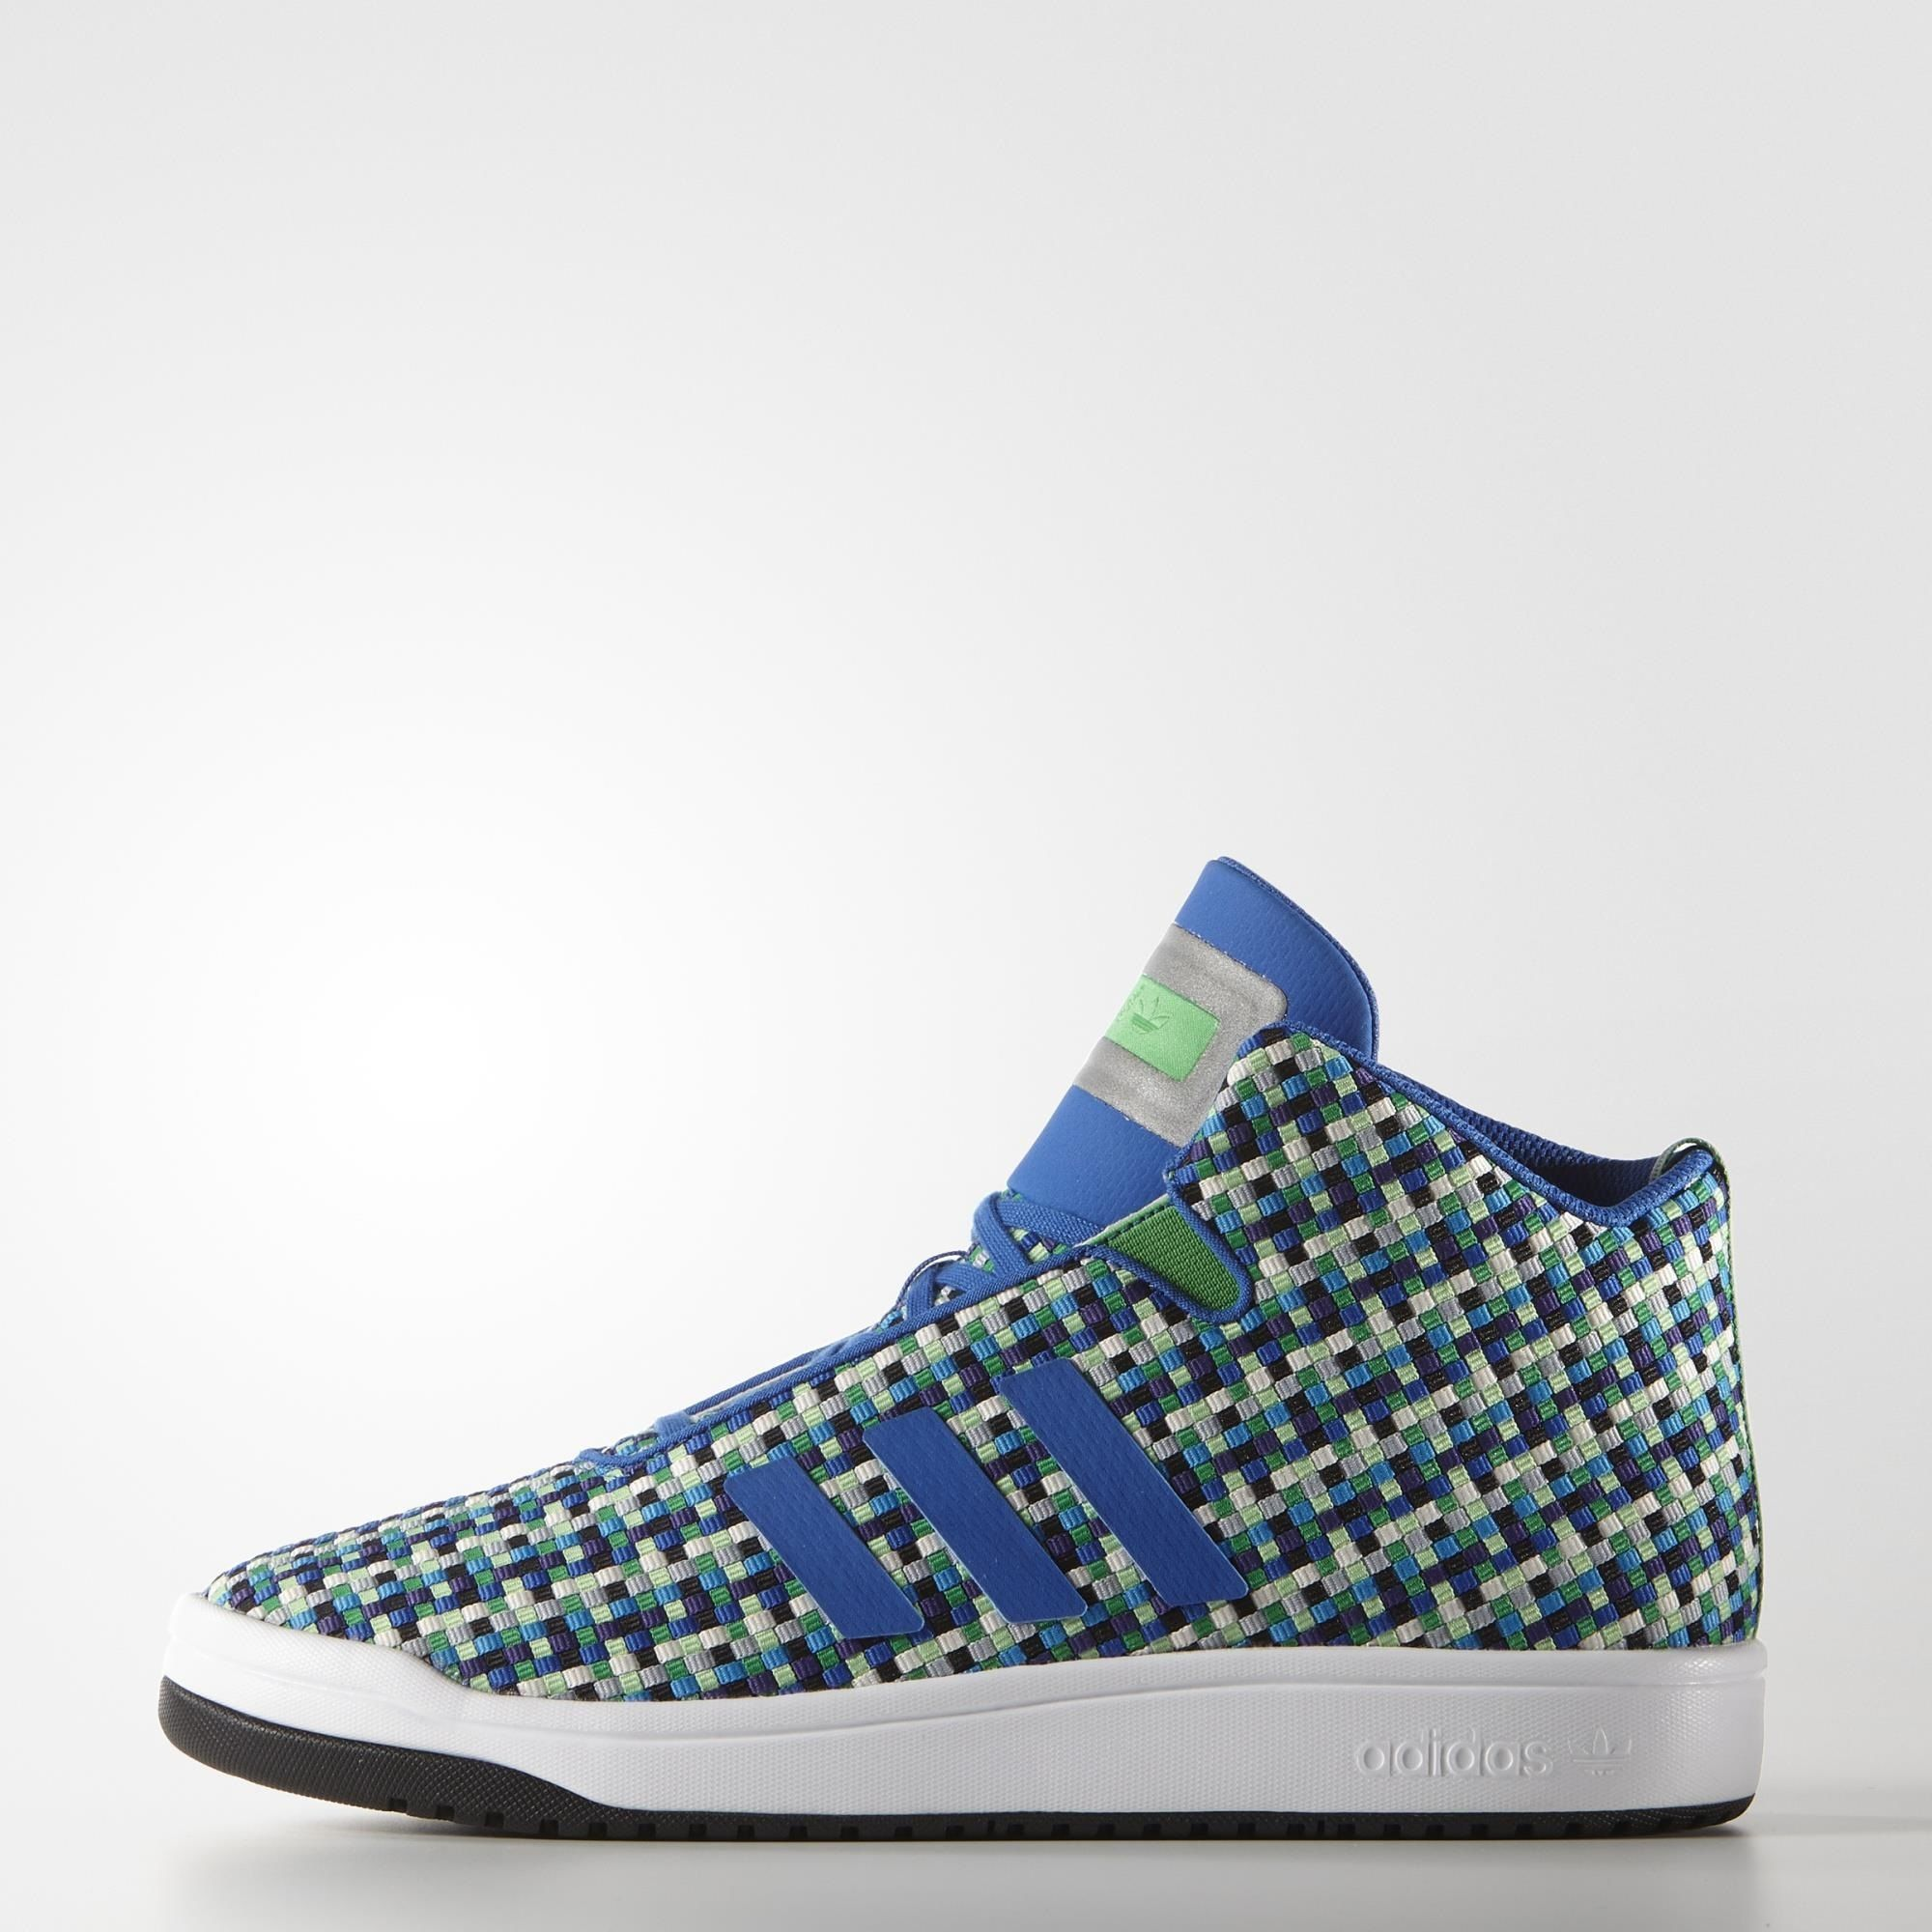 2dcd151e53ace Blue Shoes · Sneaker · Weaving · Ss16 · Adidas · Trainers · Kicks · Lovers  · Closure Weave · adidas Veritas